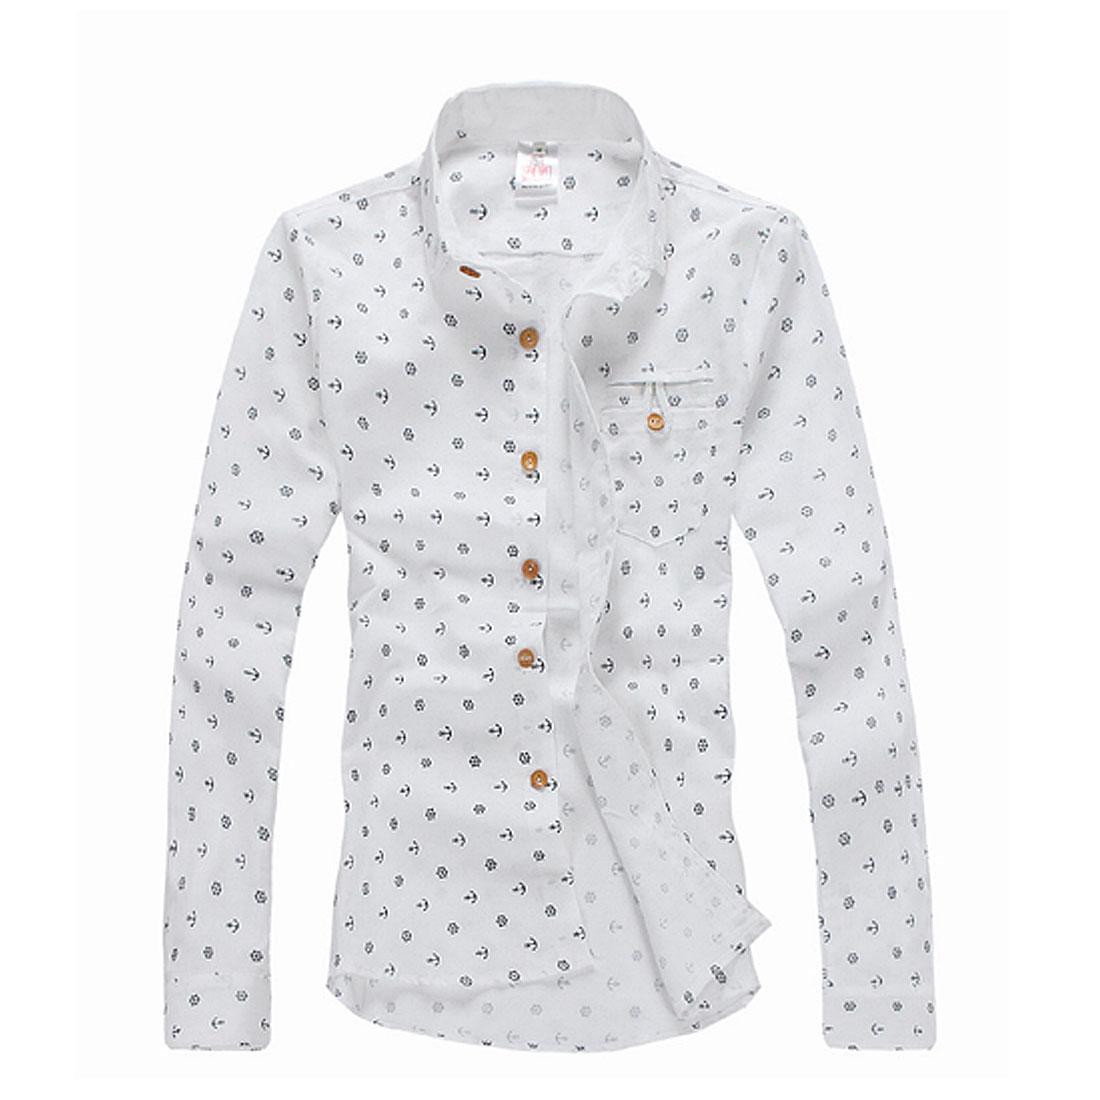 Mens Long Sleeve Rudder Printed Korea Fashion White Shirt S